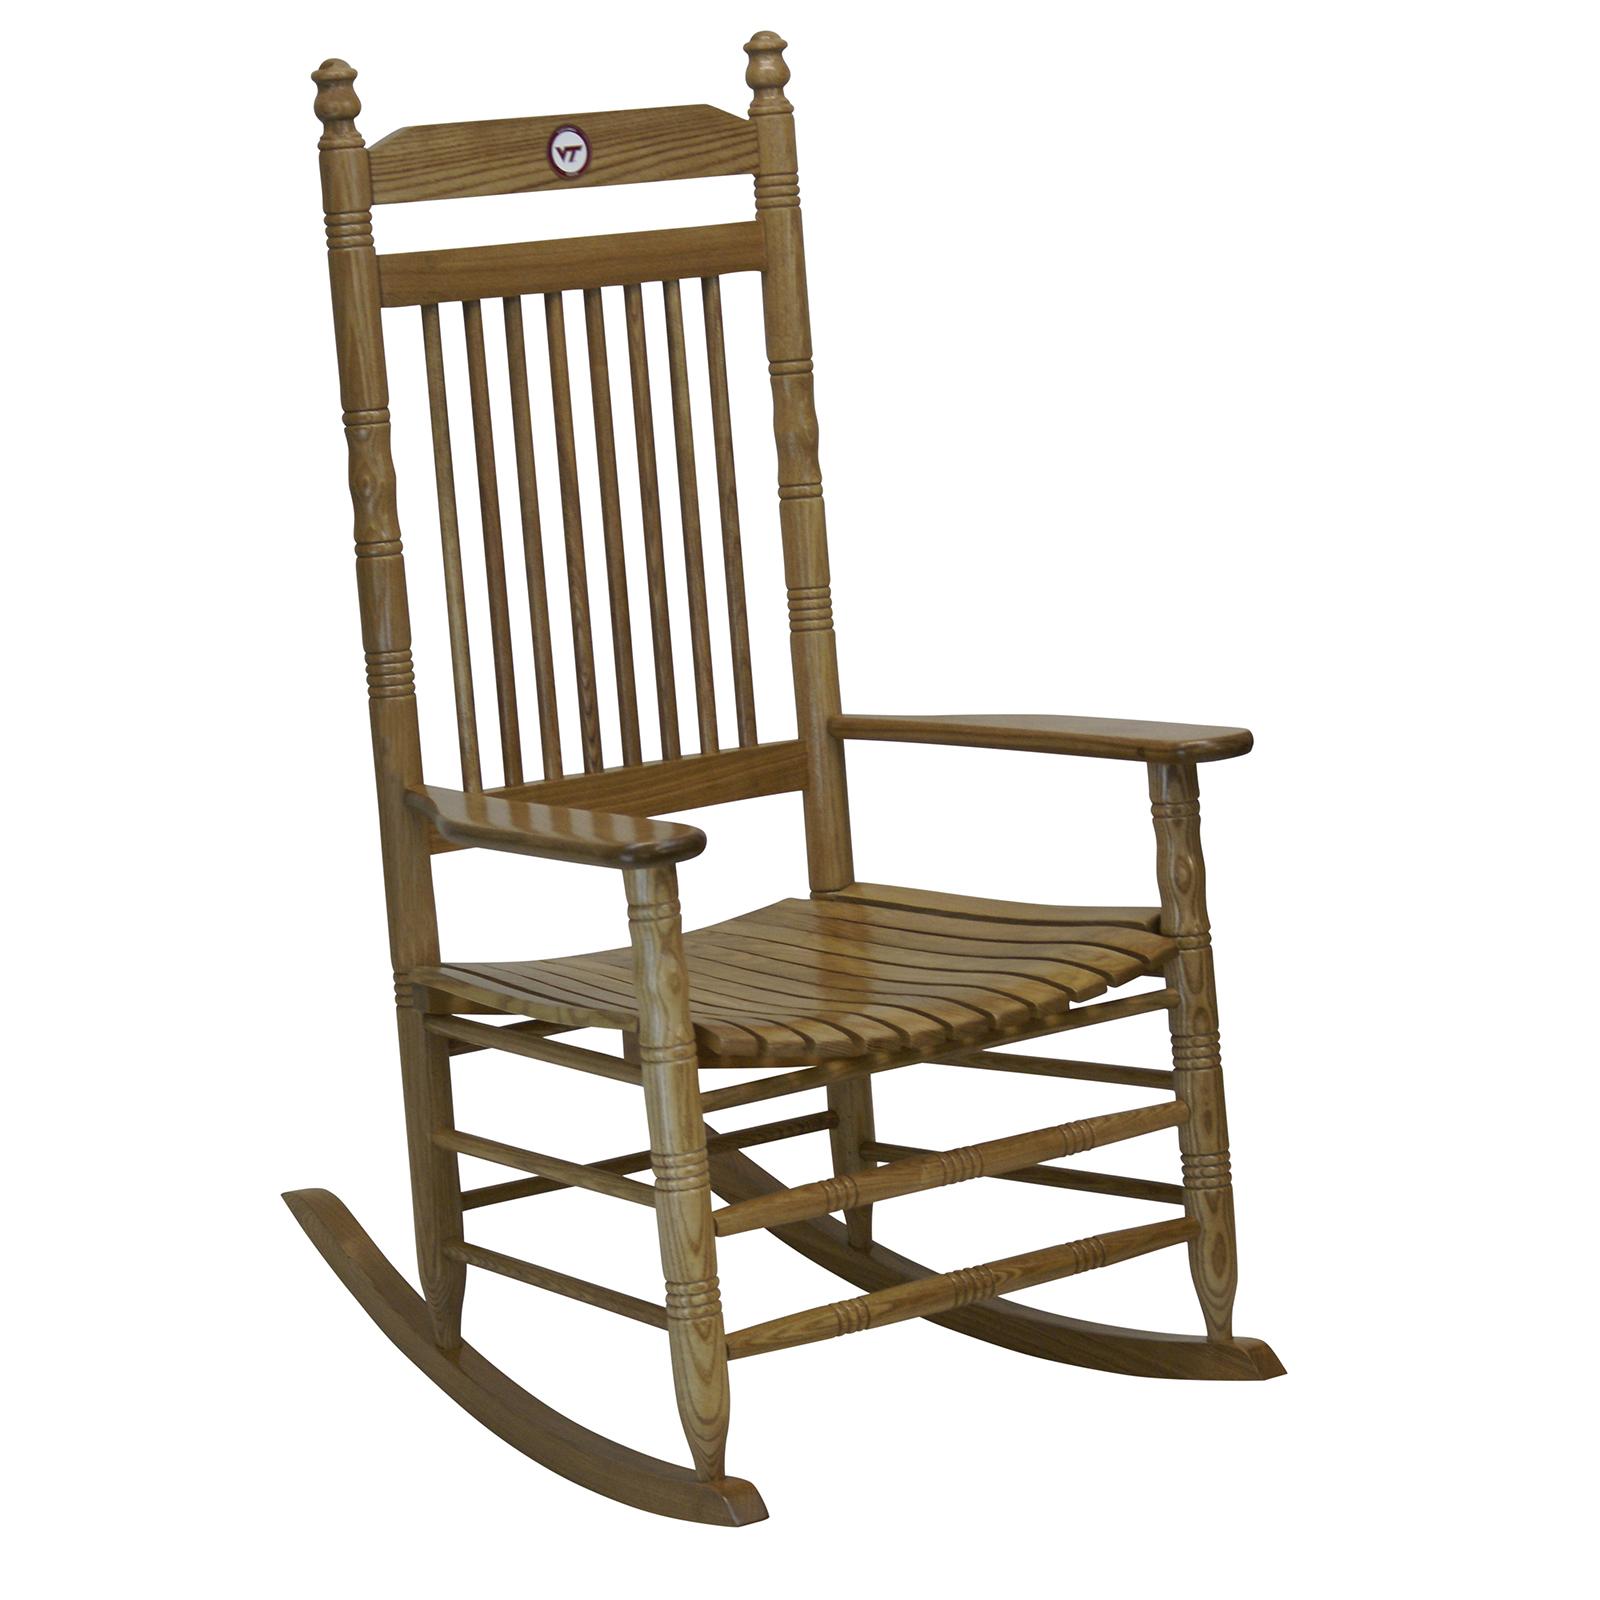 Hardwood Rocking Chair Virginia Tech Home Furniture Er Barrel Old Country